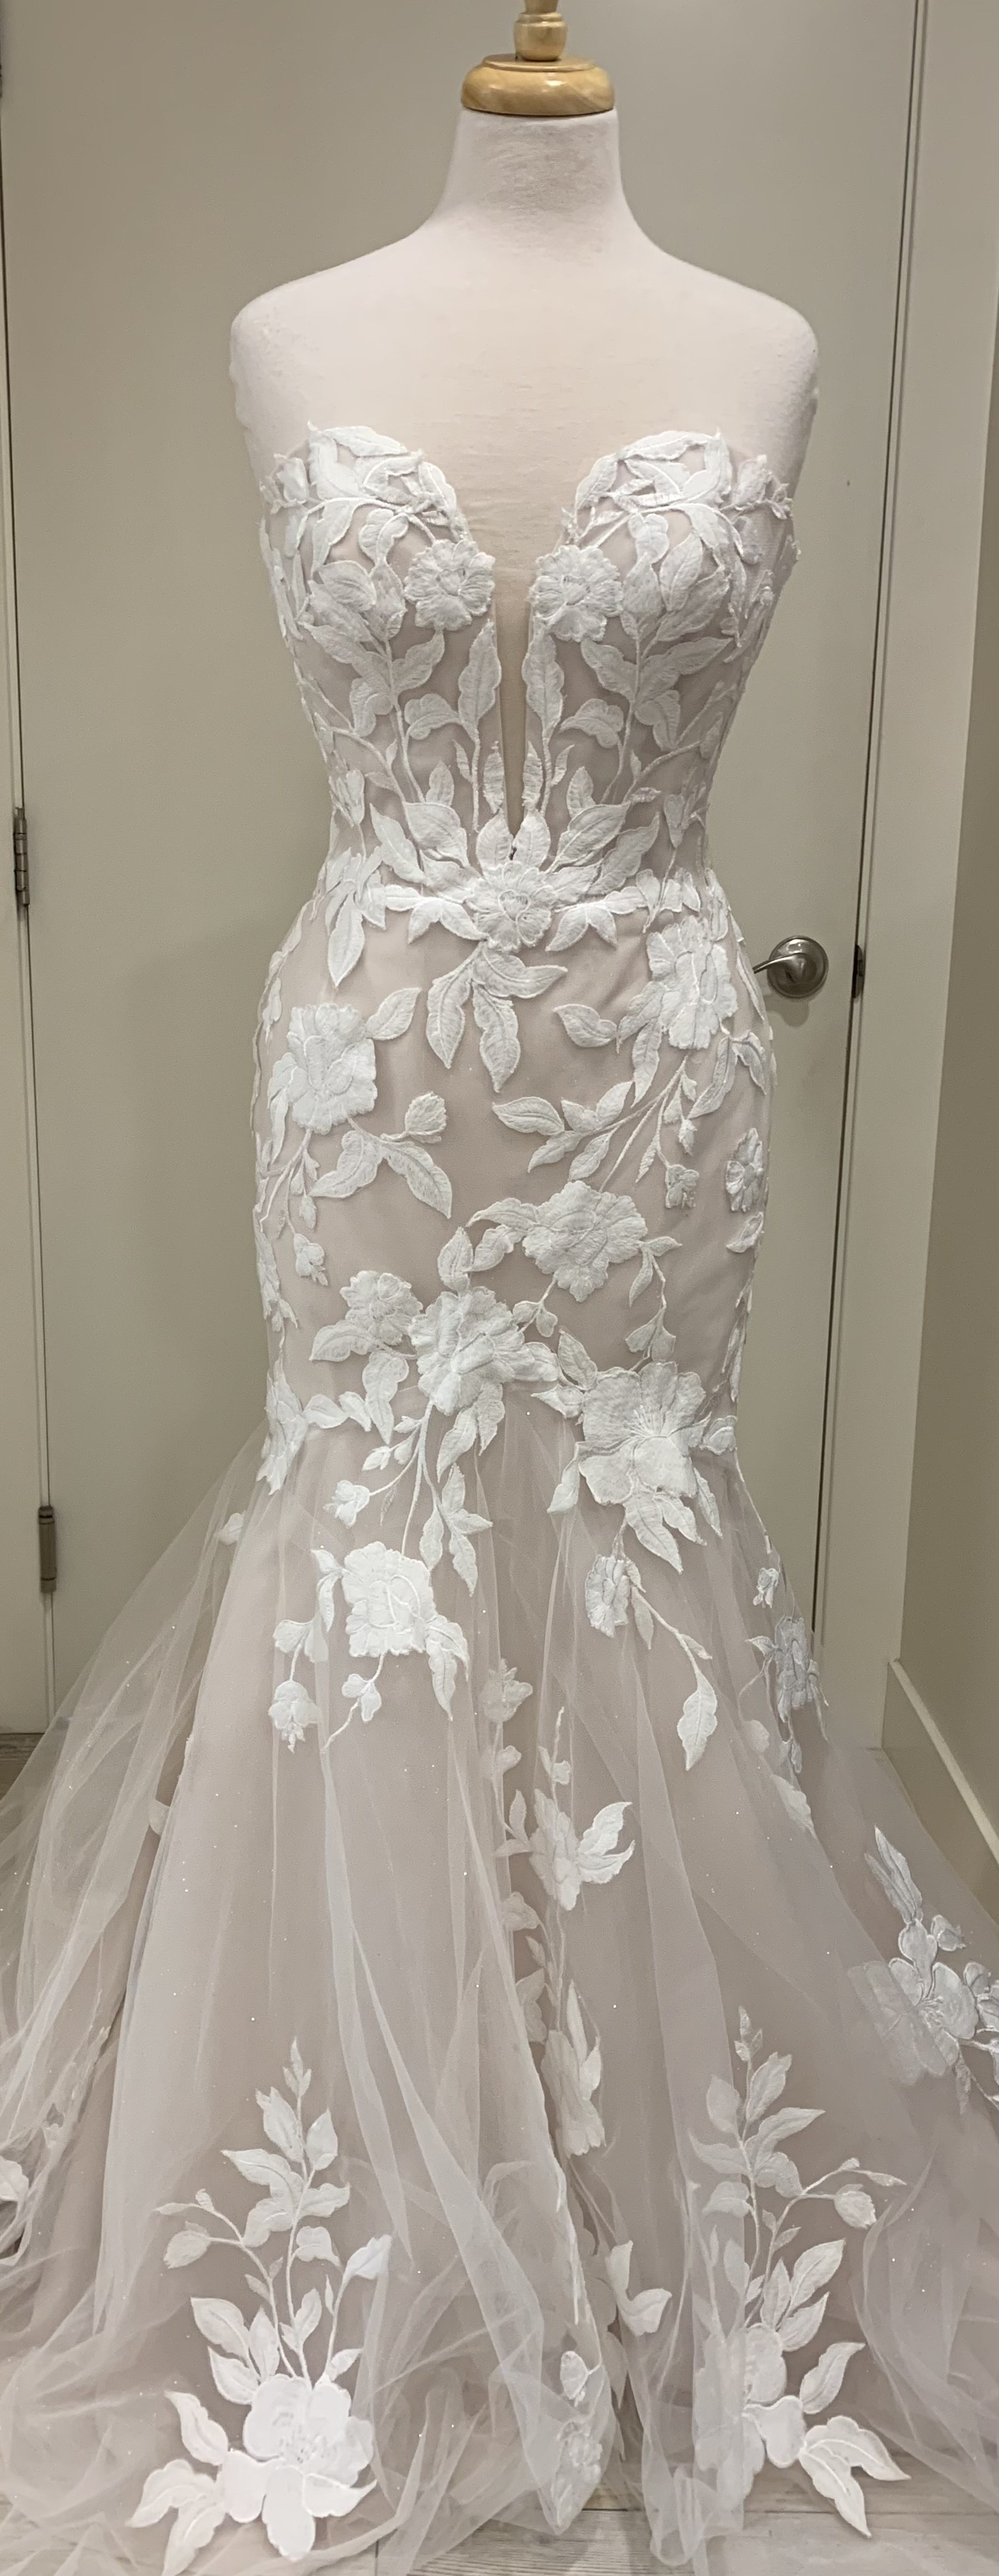 Vestido de Noiva de Rebecca Ingram - Hattie